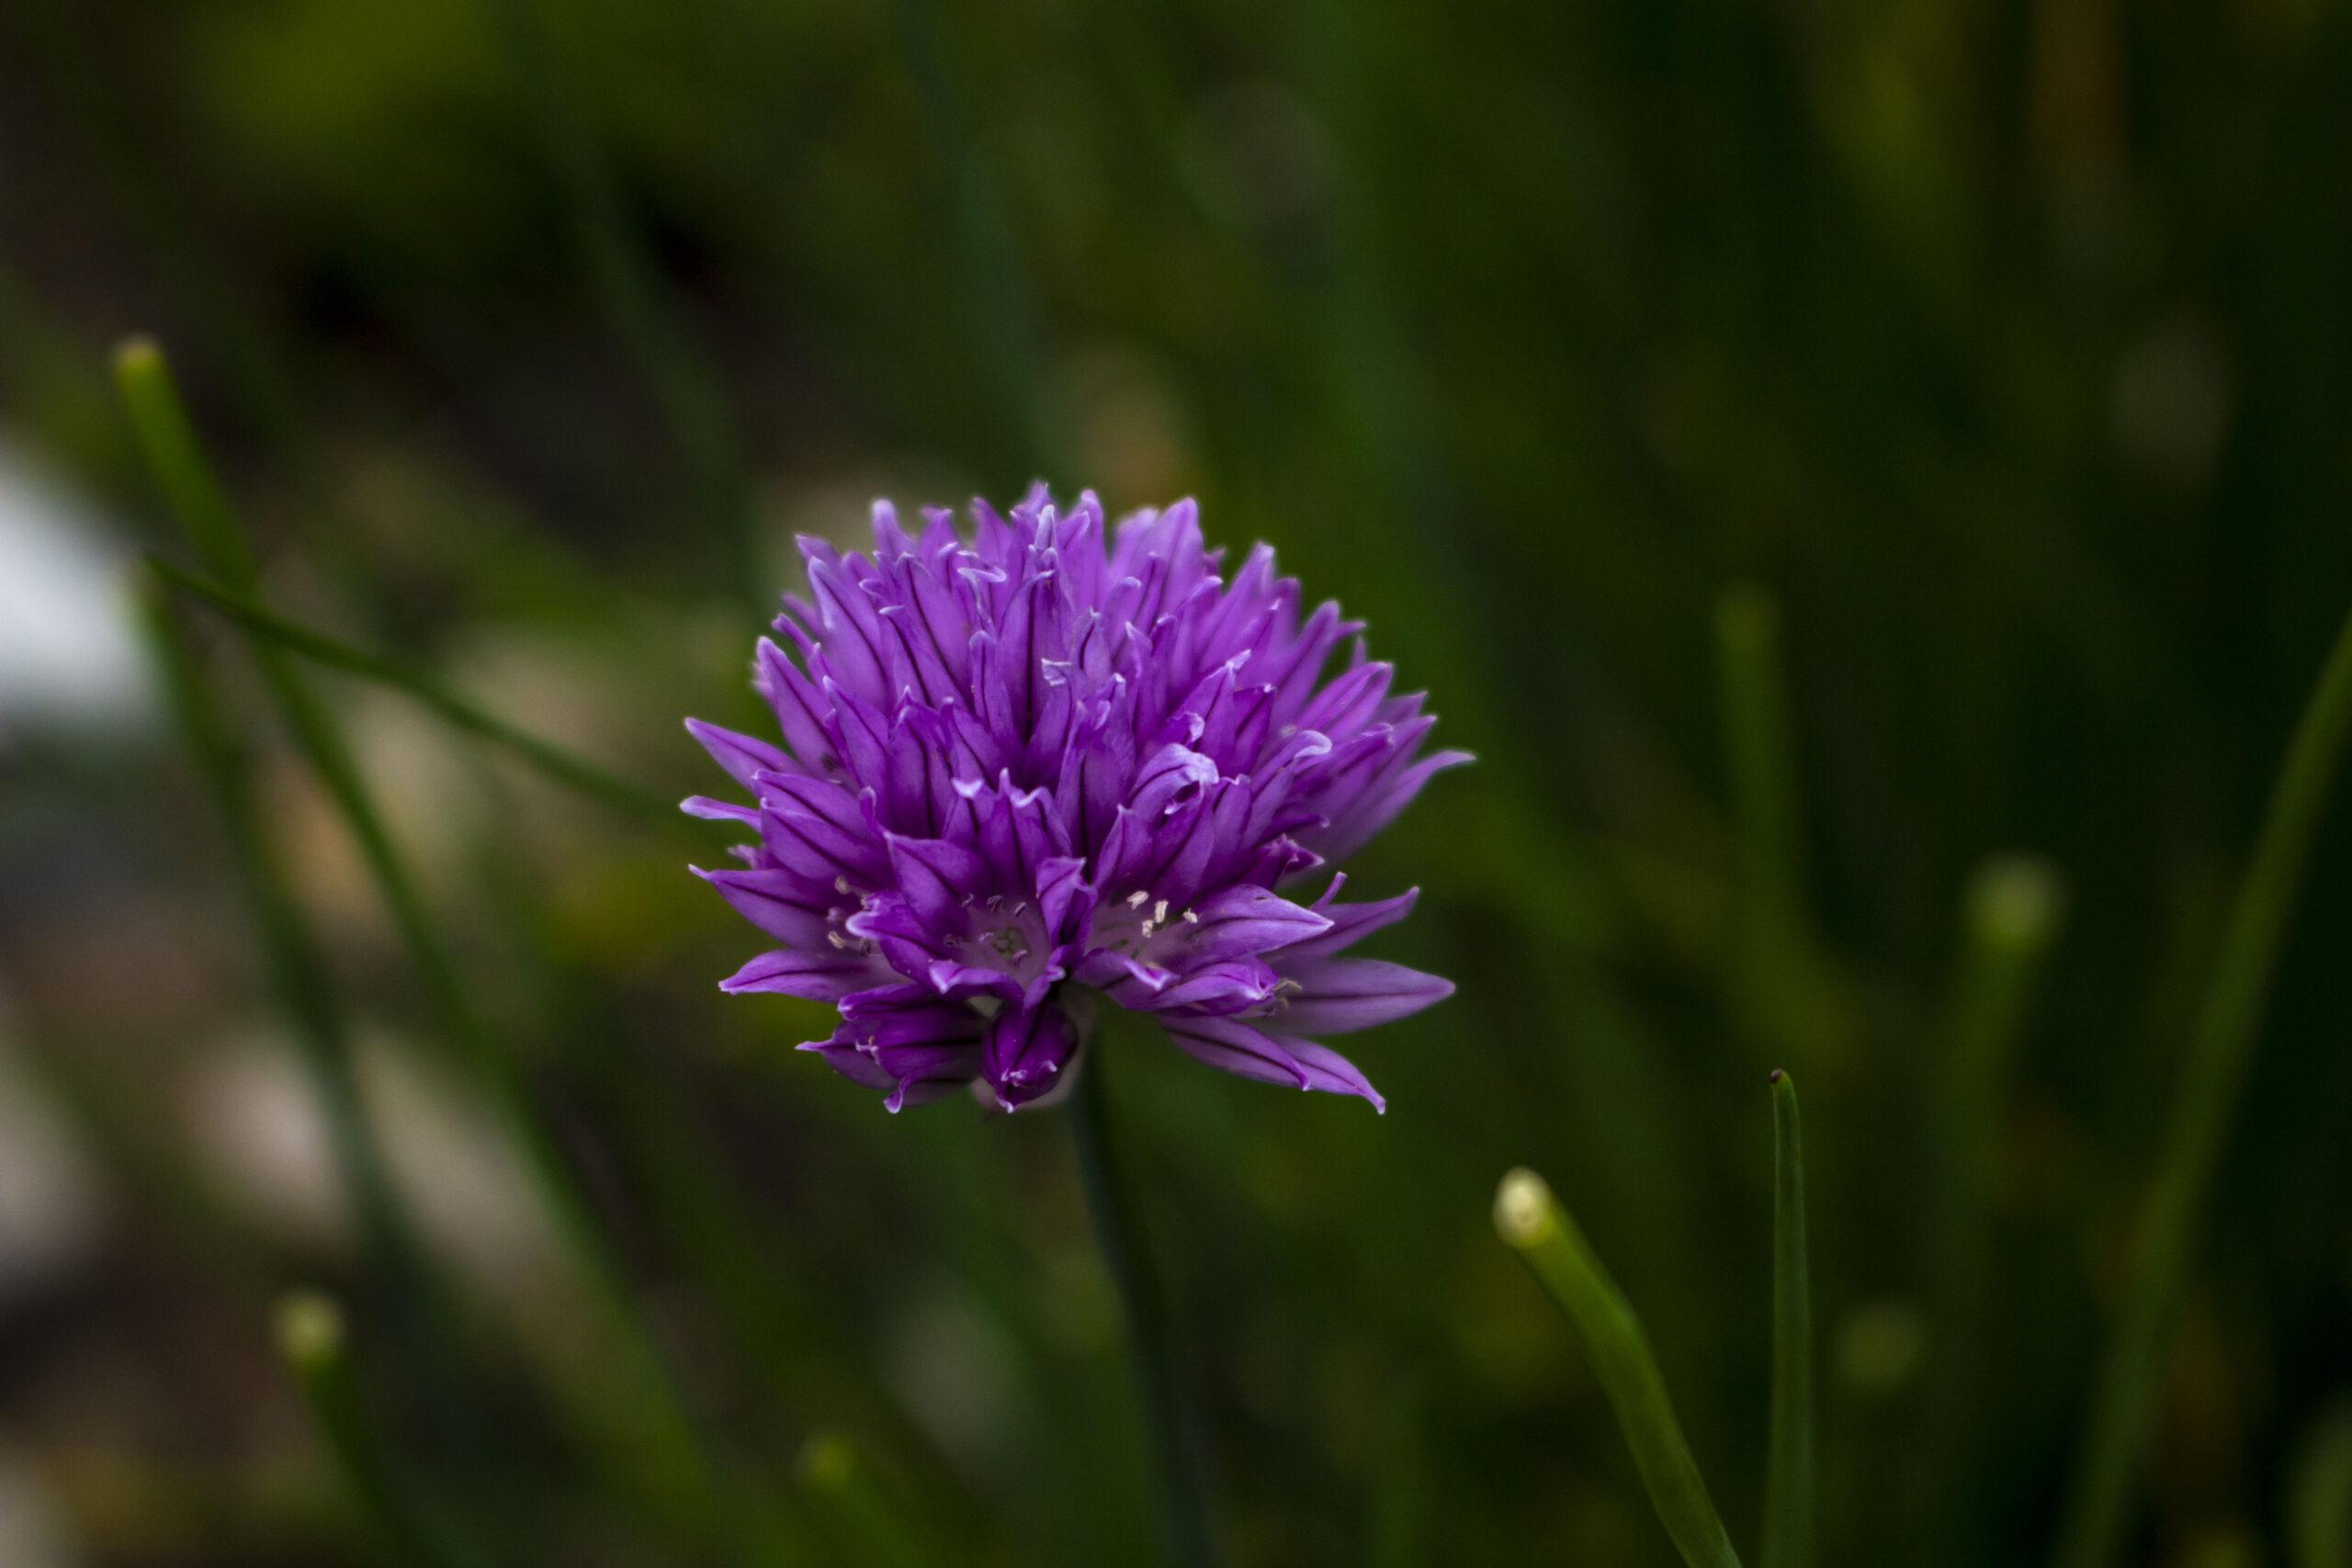 Purløg – Allium schoenoprasum